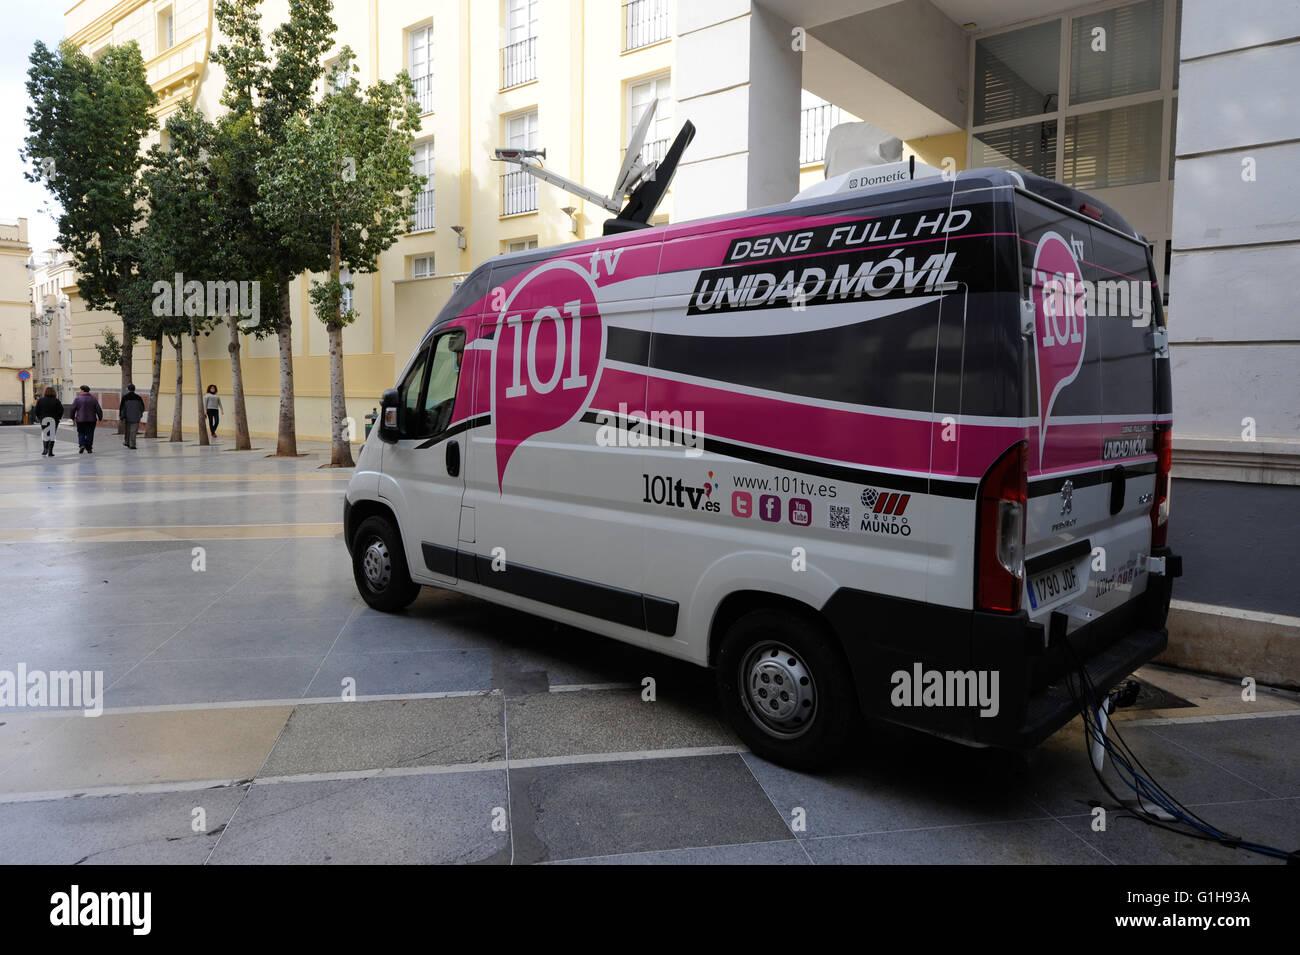 broadcasting truck in Malaga Spain - Stock Image